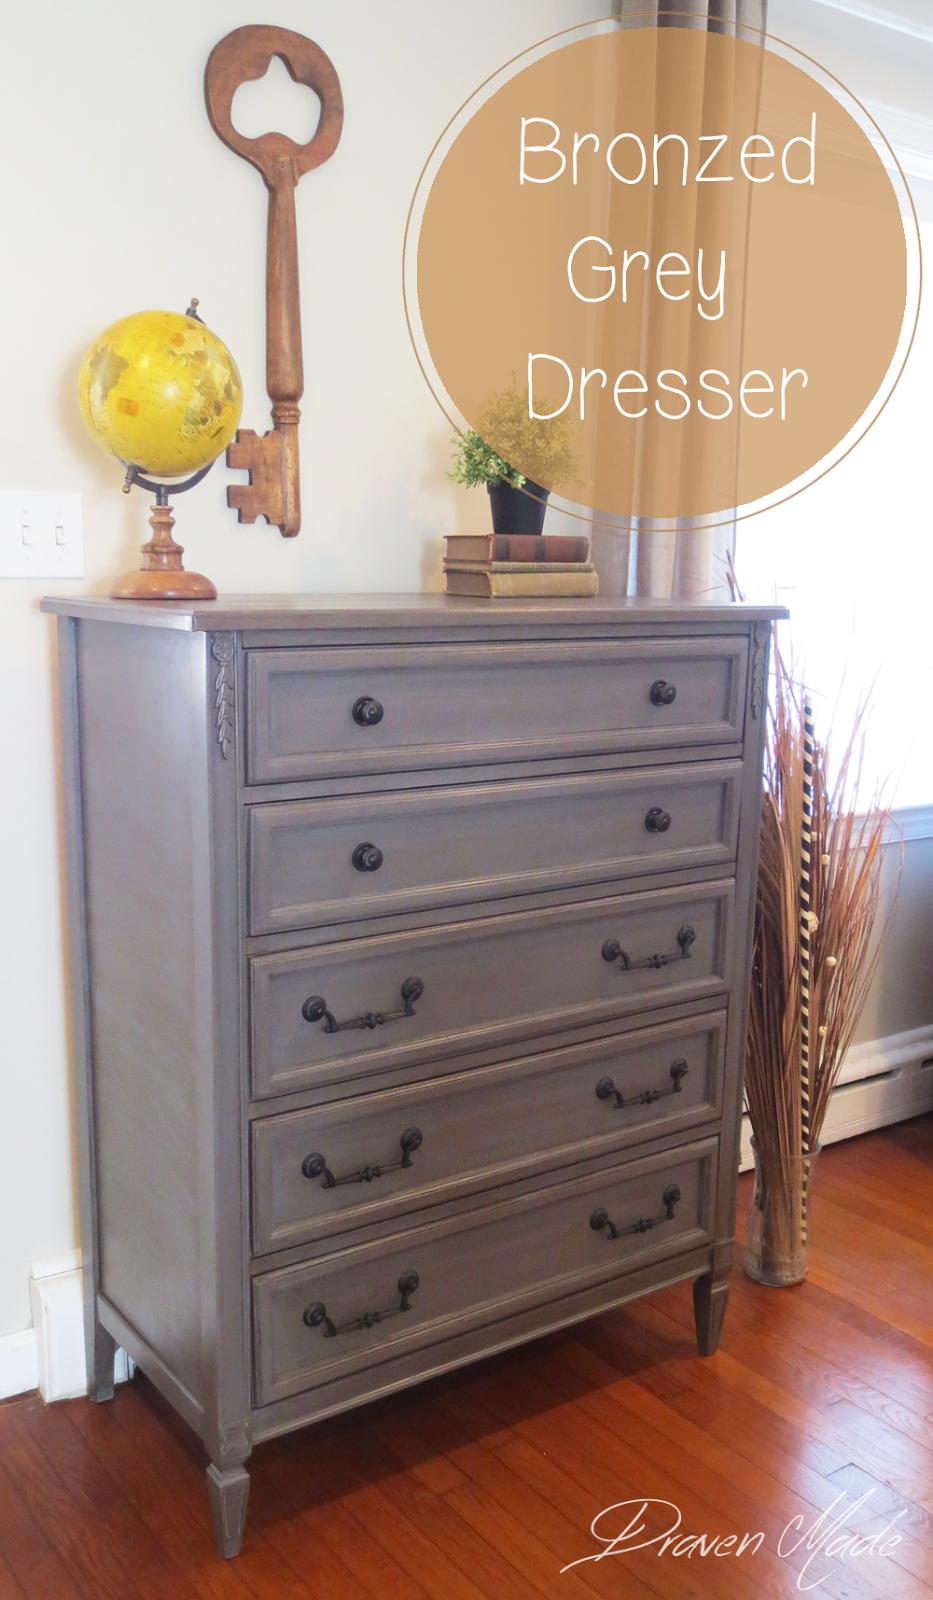 How To Glaze Furniture Bronze Gray Dresser Living In A Fixer Upper Painted Bedroom Furniture Grey Dresser Furniture Makeover [ 1600 x 933 Pixel ]